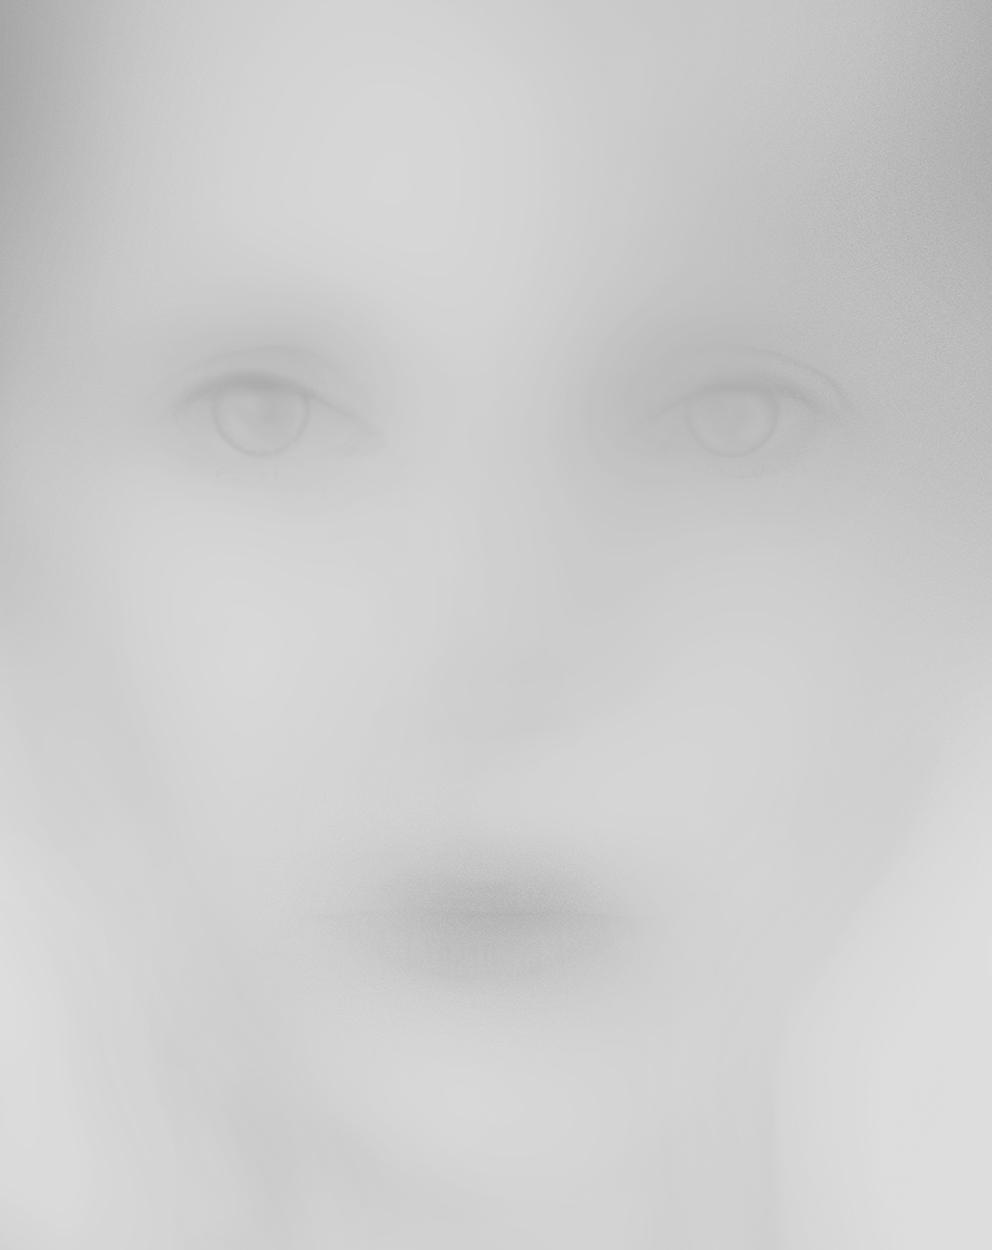 Yotta Kippe | n06072010f_n, 125 x 100 cm, Ilfojet print on metal foil / aludibond, graphite